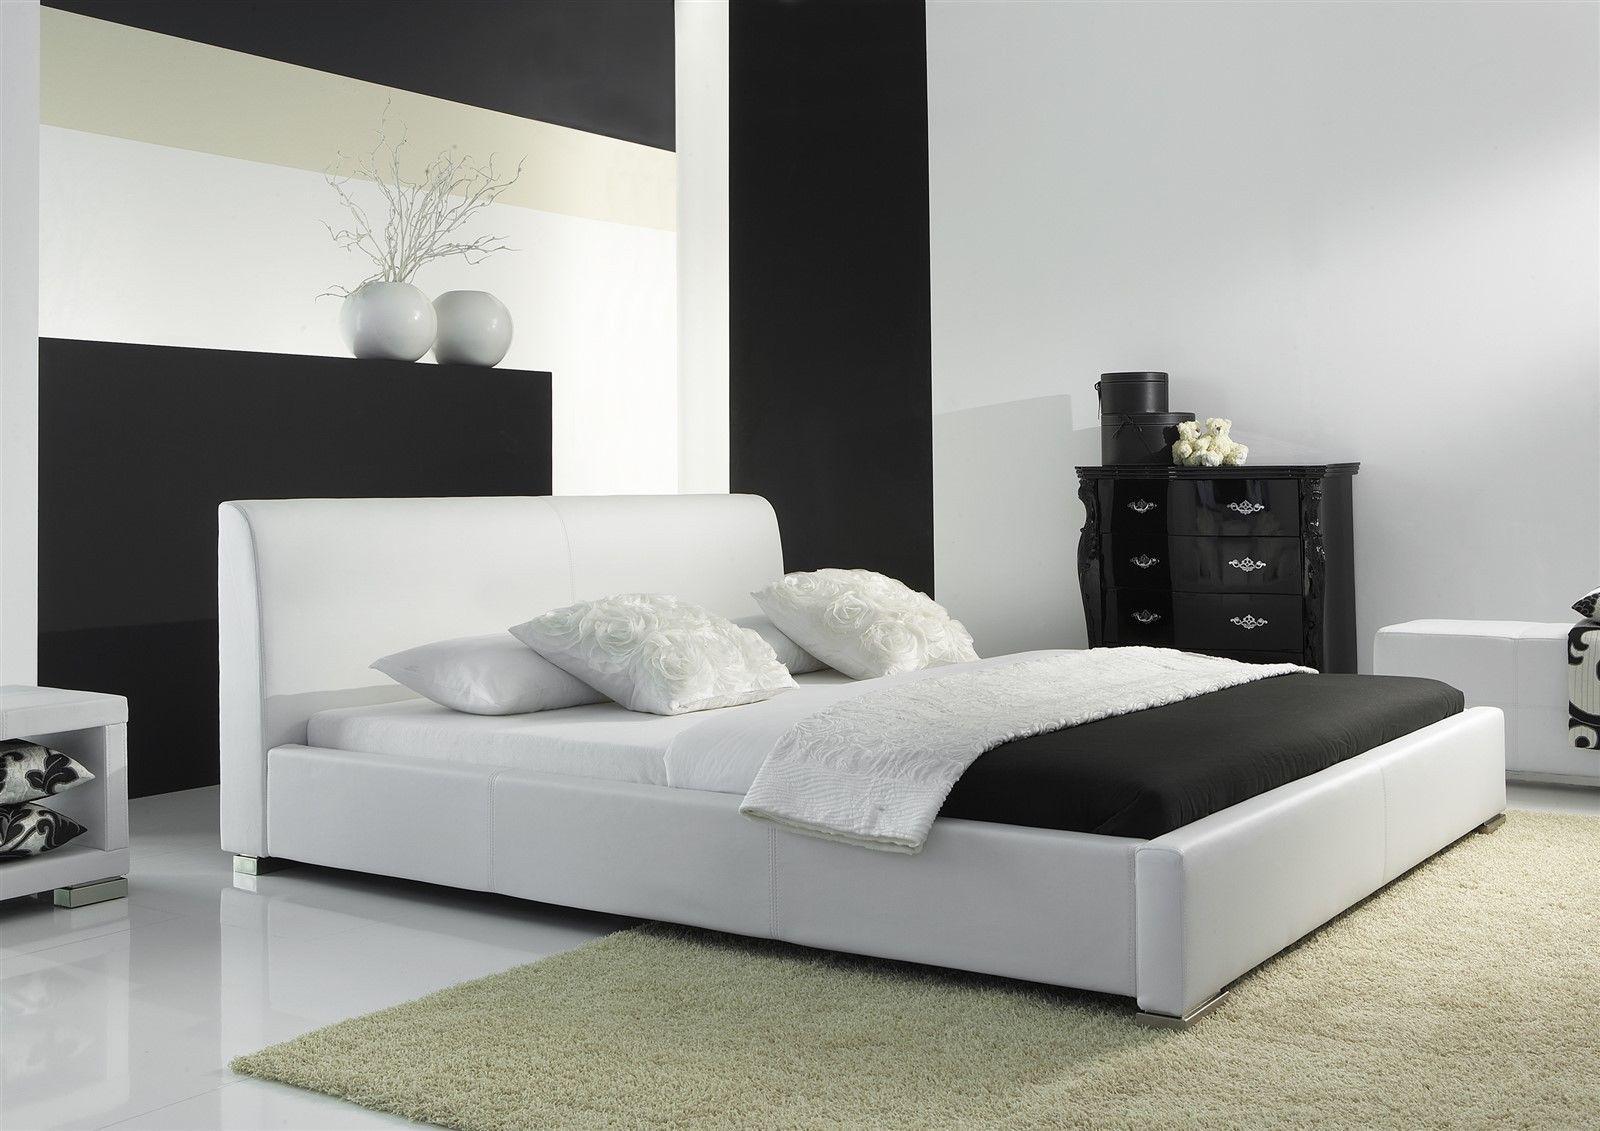 tagesbett 140x200 awesome sitzer schlafsofa nansen x cm with tagesbett 140x200 elegant ikea. Black Bedroom Furniture Sets. Home Design Ideas